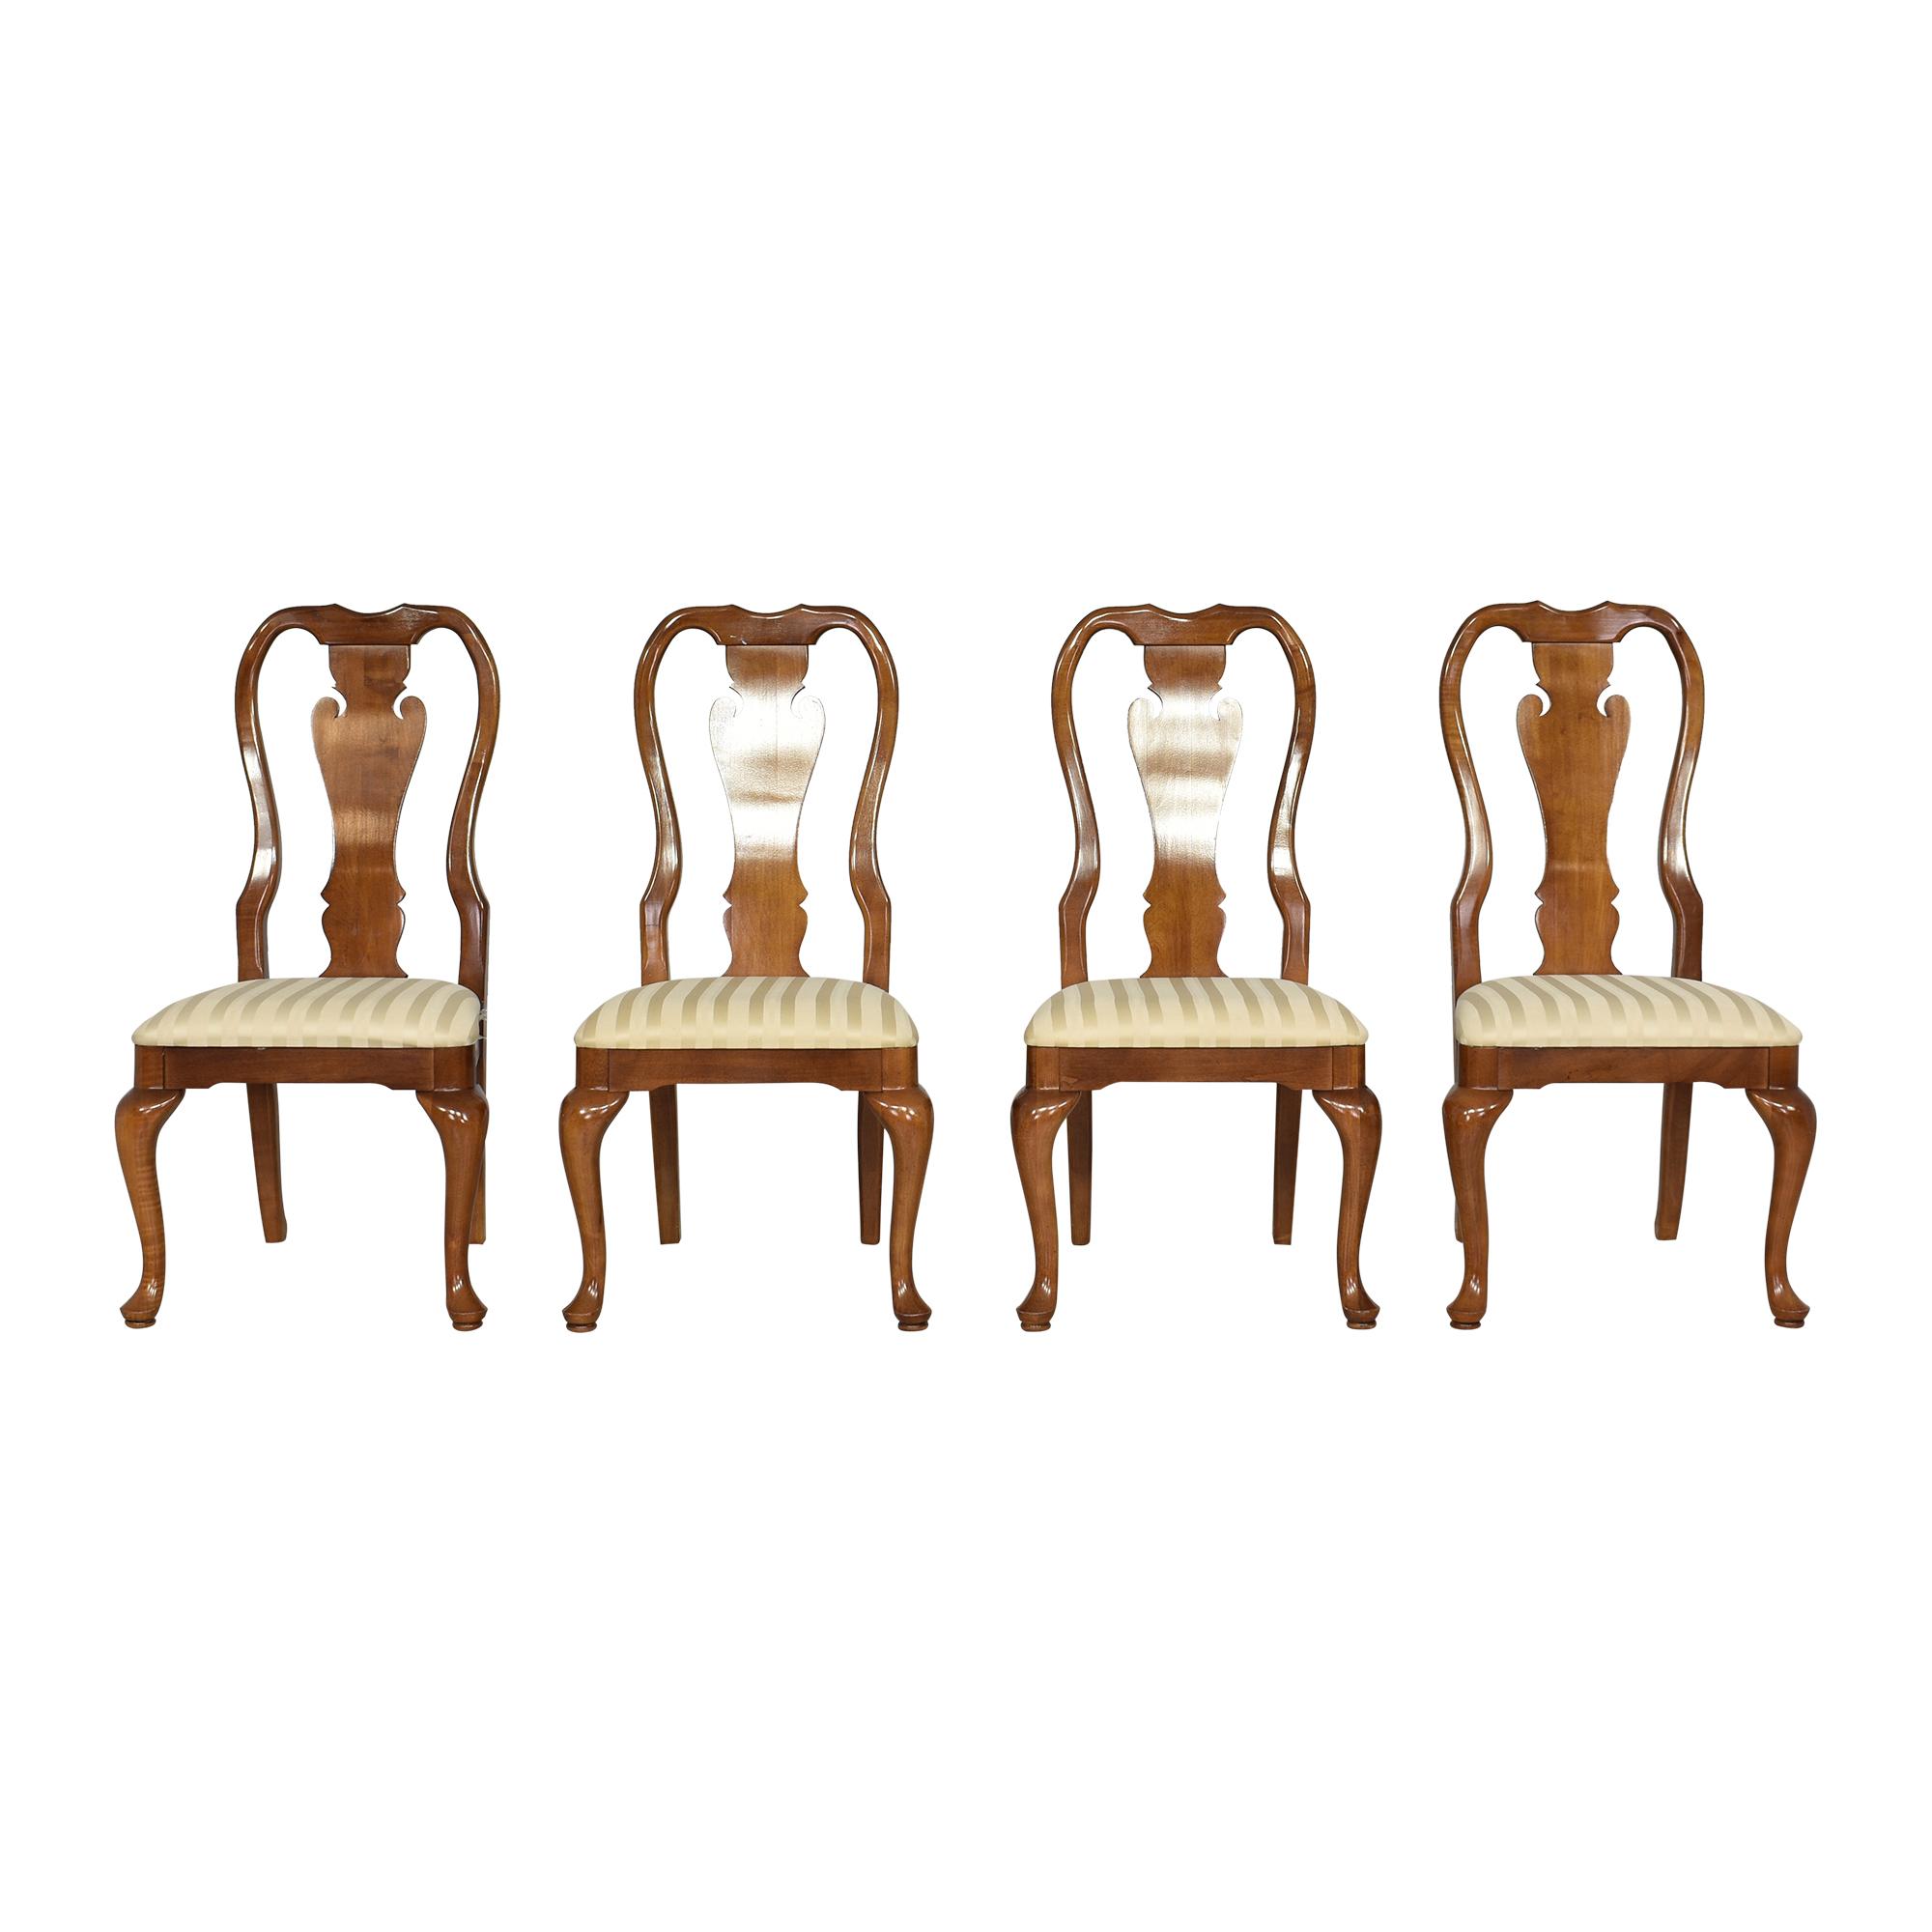 Thomasville Thomasville Queen Anne Dining Chairs brown